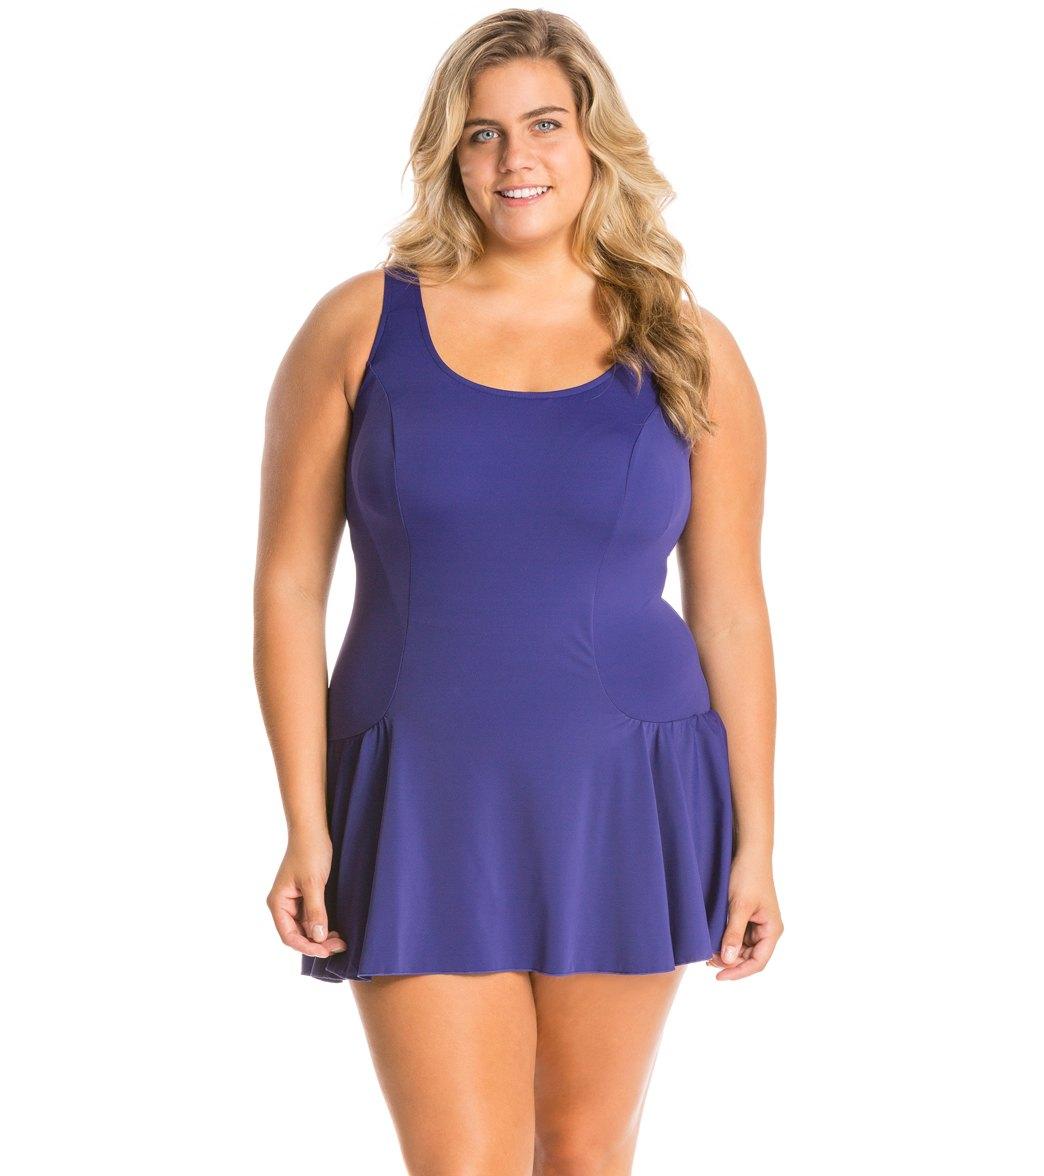 Plus Size Swim Dresses for Women